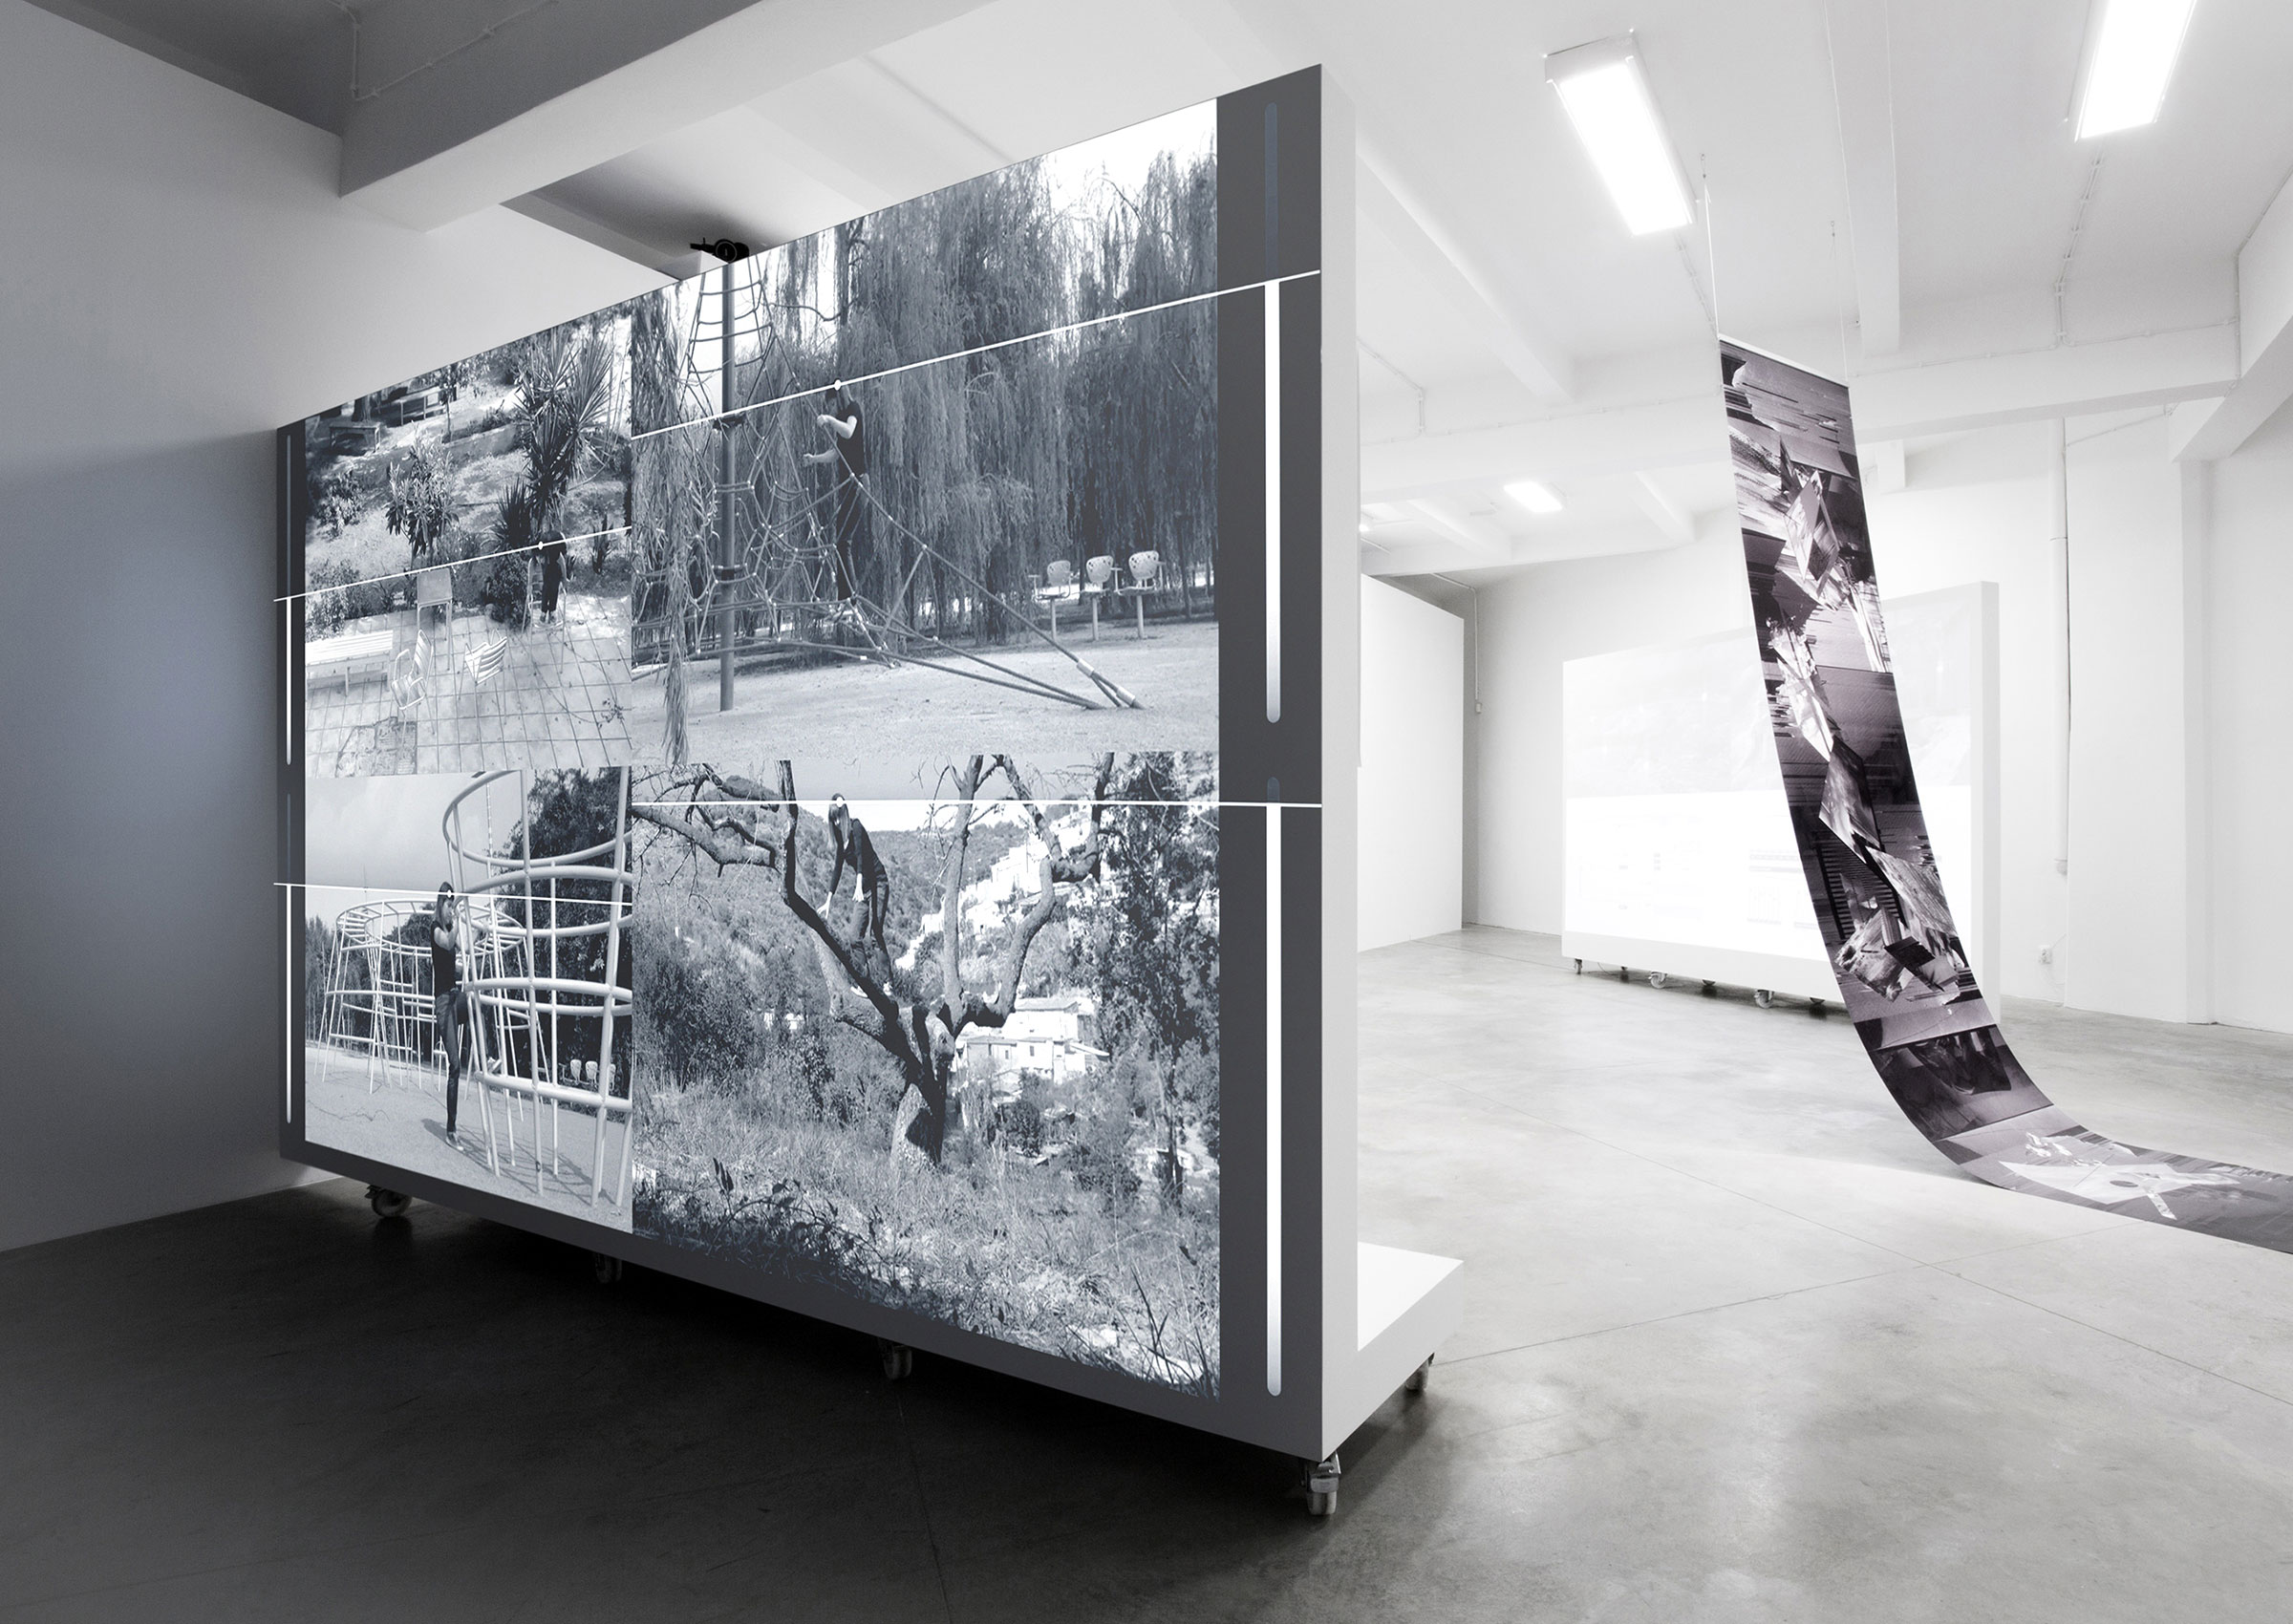 Jacek Doroszenko - The same horizon repeated at every moment of the walk - FAIT Gallery, Brno